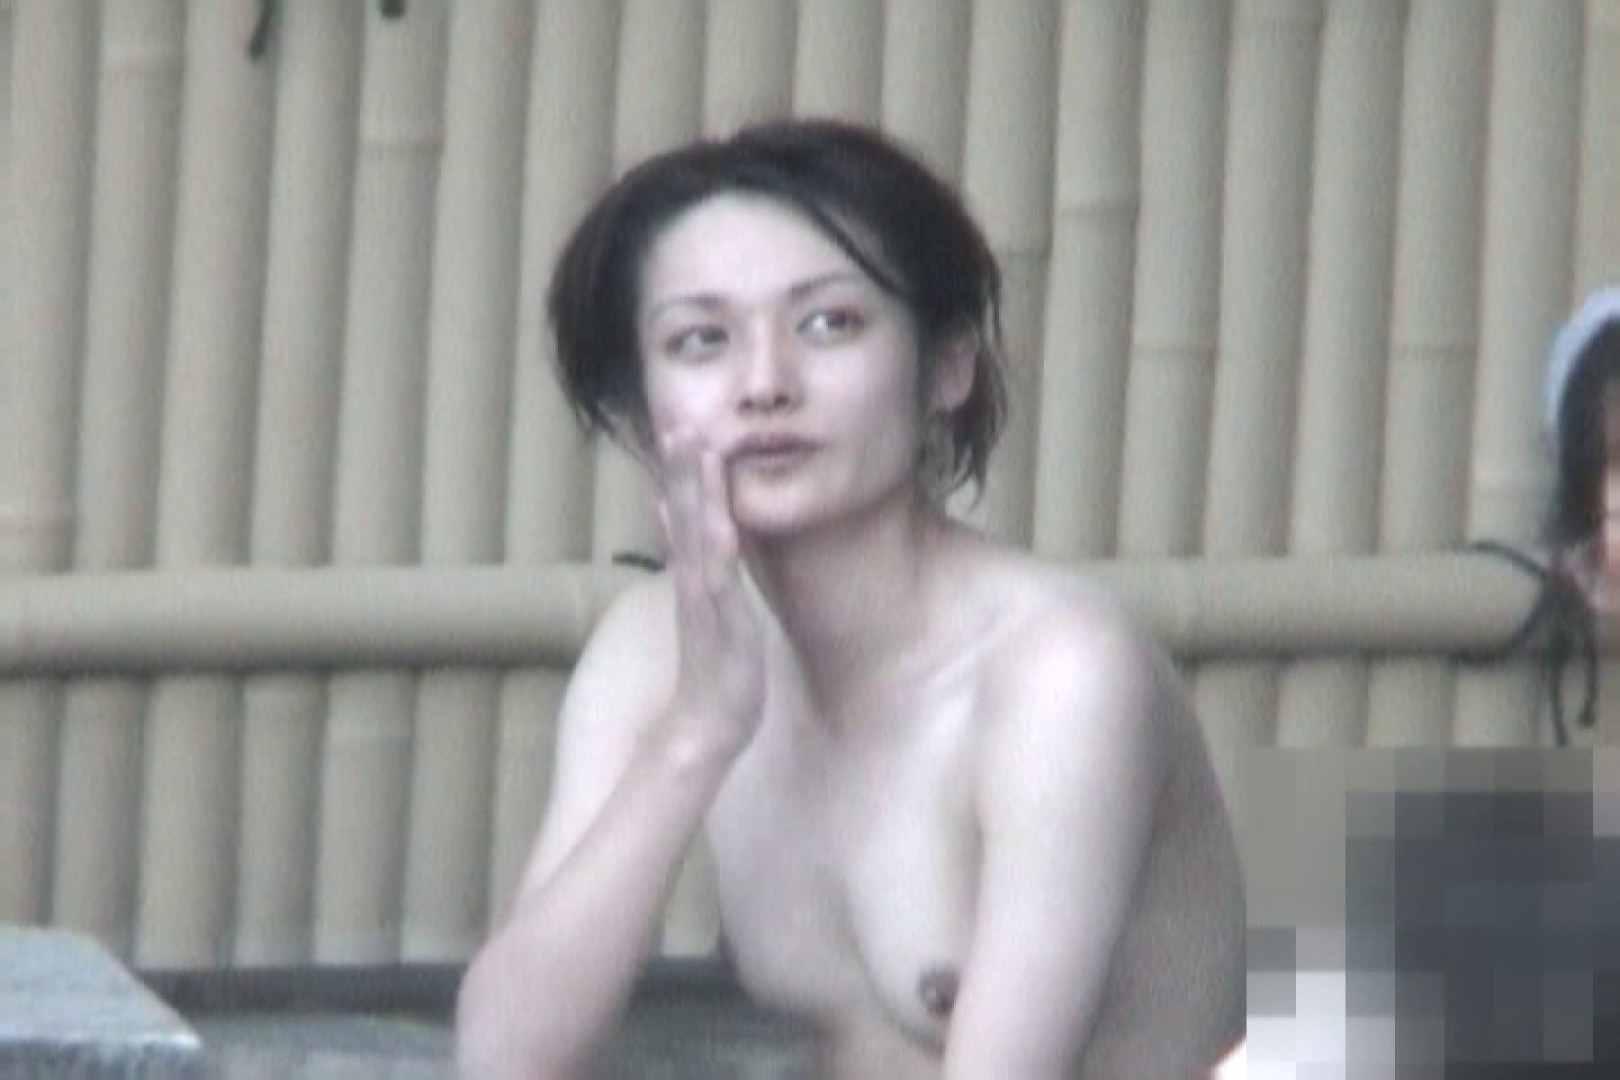 Aquaな露天風呂Vol.839 盗撮師作品  96pic 87